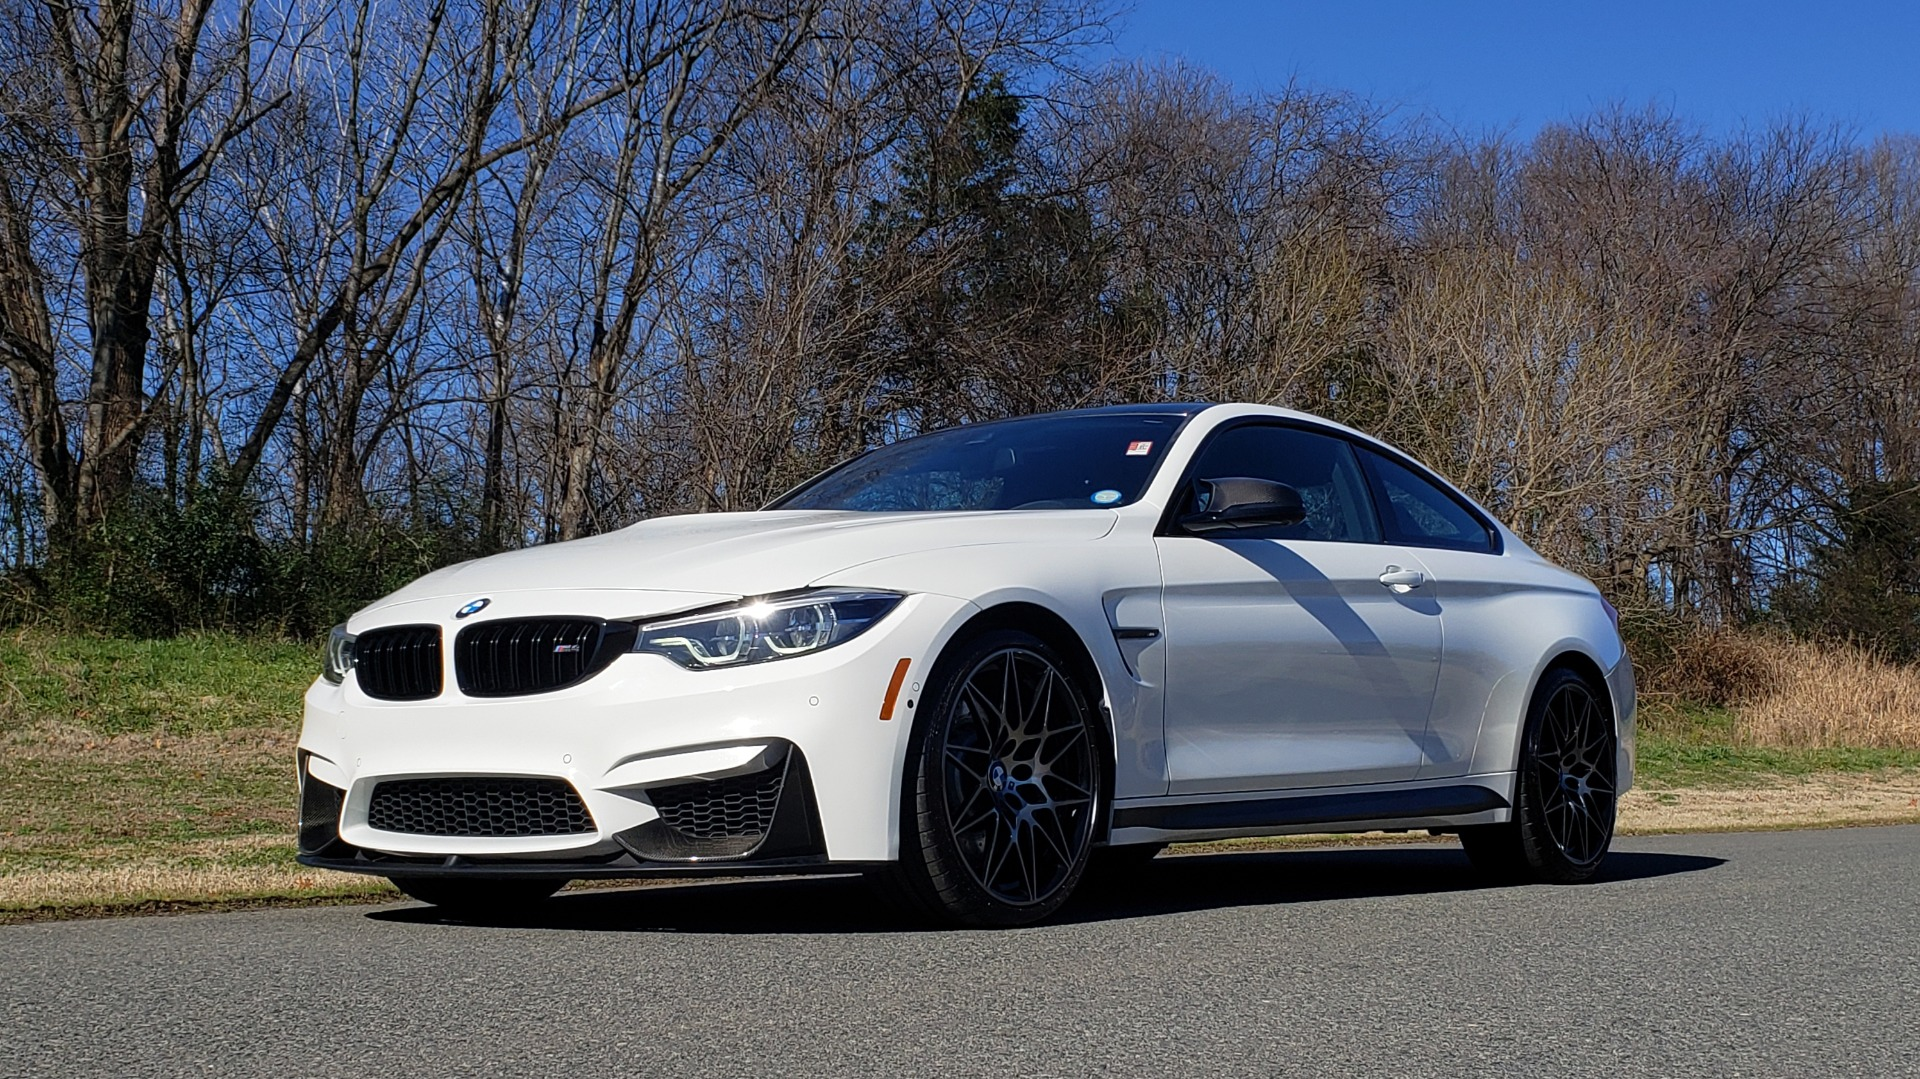 Used 2018 BMW M4 COMP PKG / EXEC / M-DRIVER / PARK CNTRL / ACTIVE BLIND SPOT for sale Sold at Formula Imports in Charlotte NC 28227 1